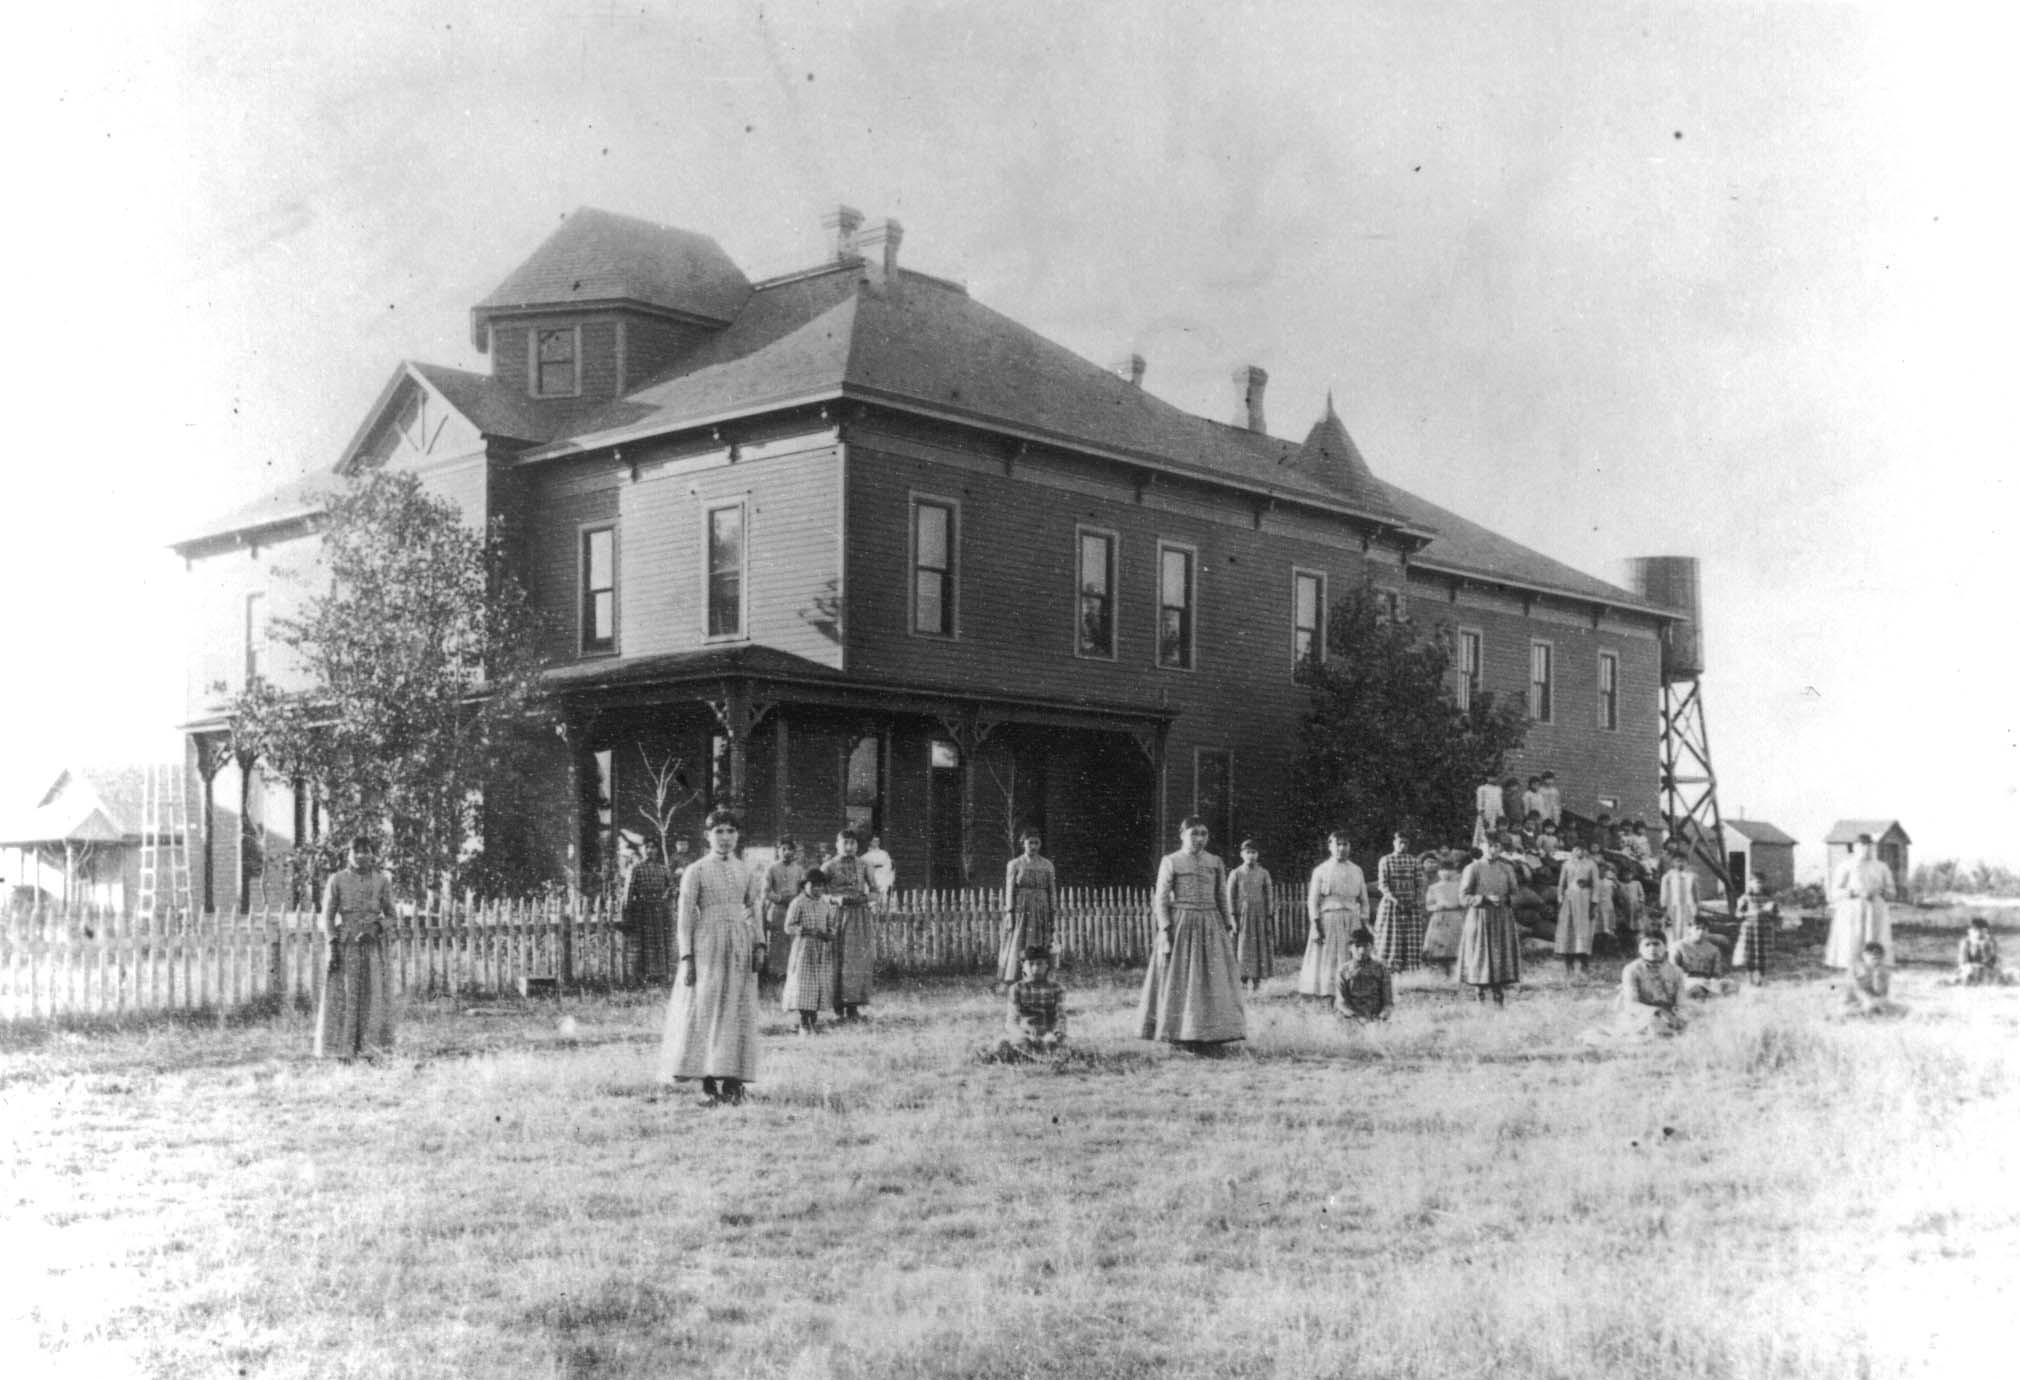 Cheyenne River Indian School